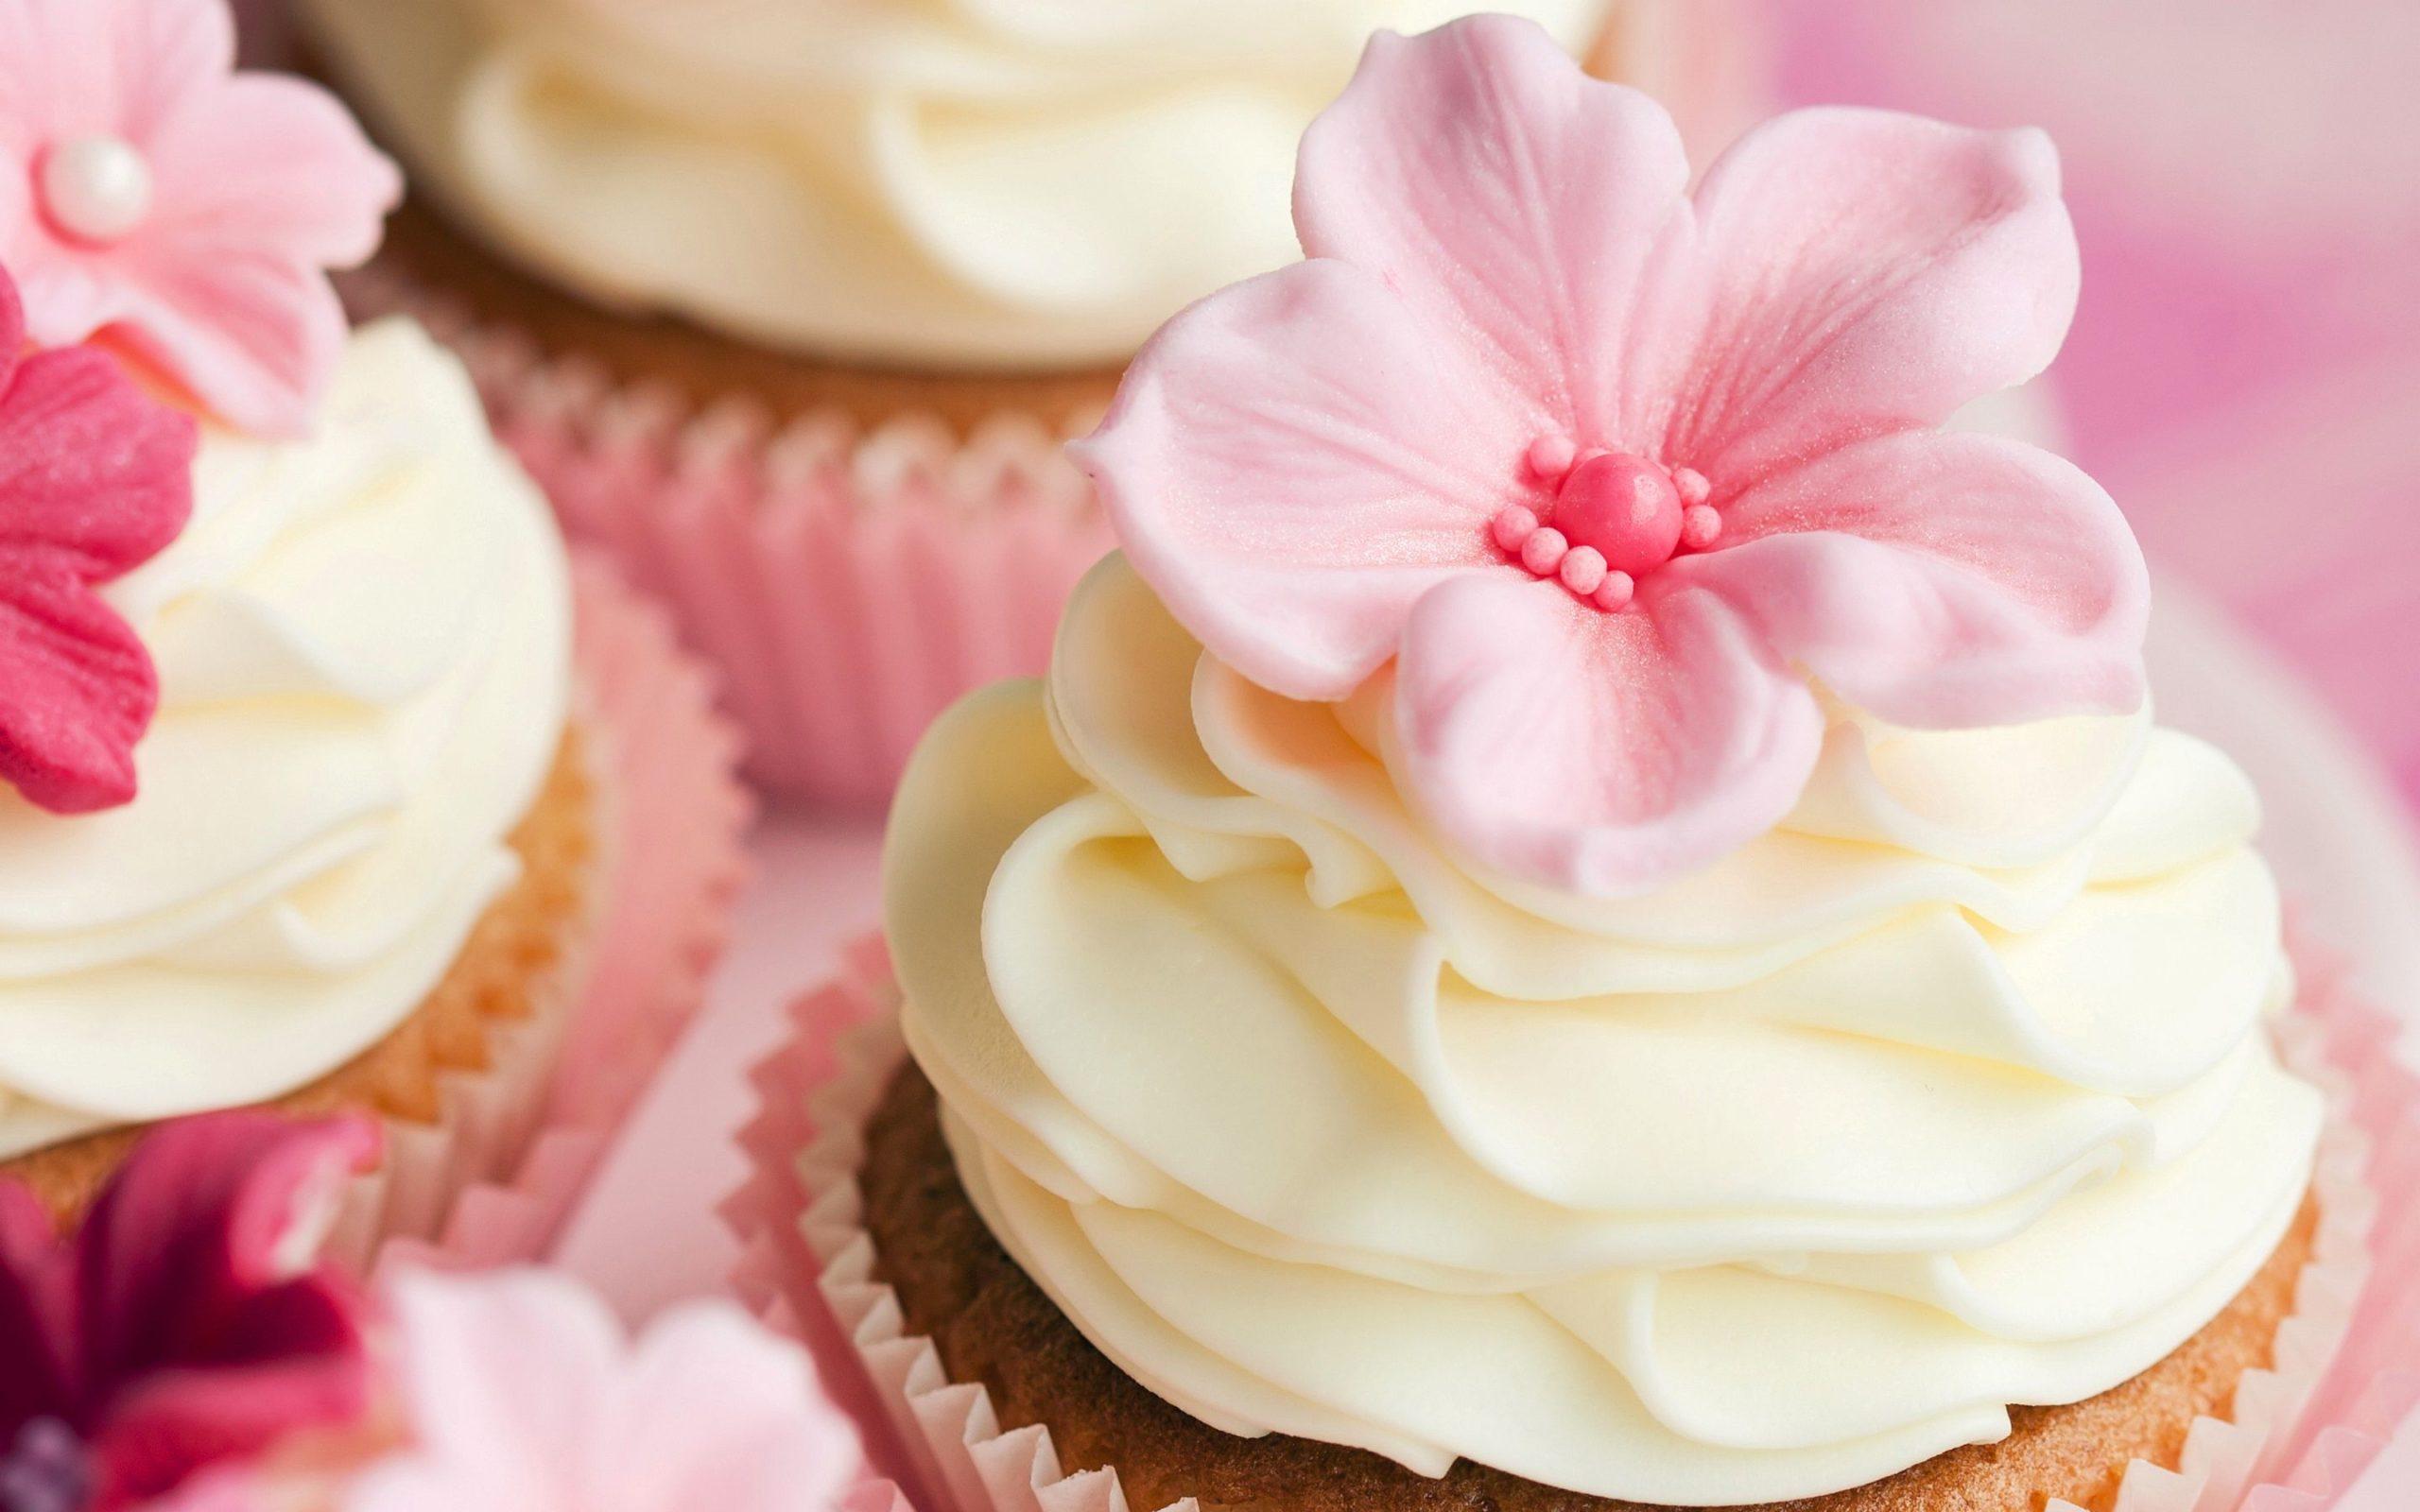 cupcake hd wallpapers